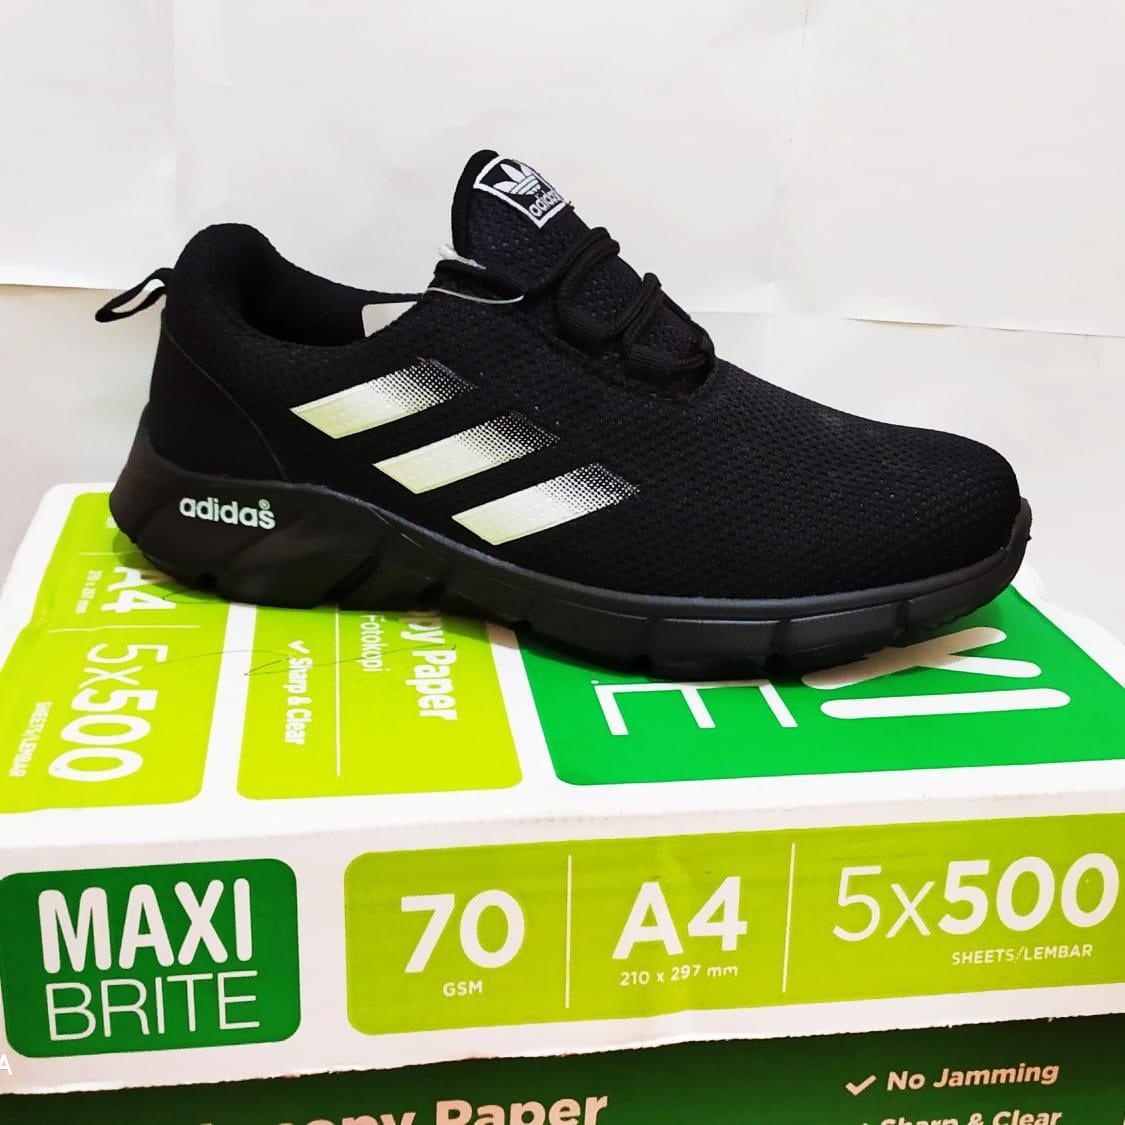 Nike1 Sportswear Tanjun Sepatu Olahraga Wanita Sepatu Sneakers Kasual Running Ringan Terbaru Terlaris amiiin